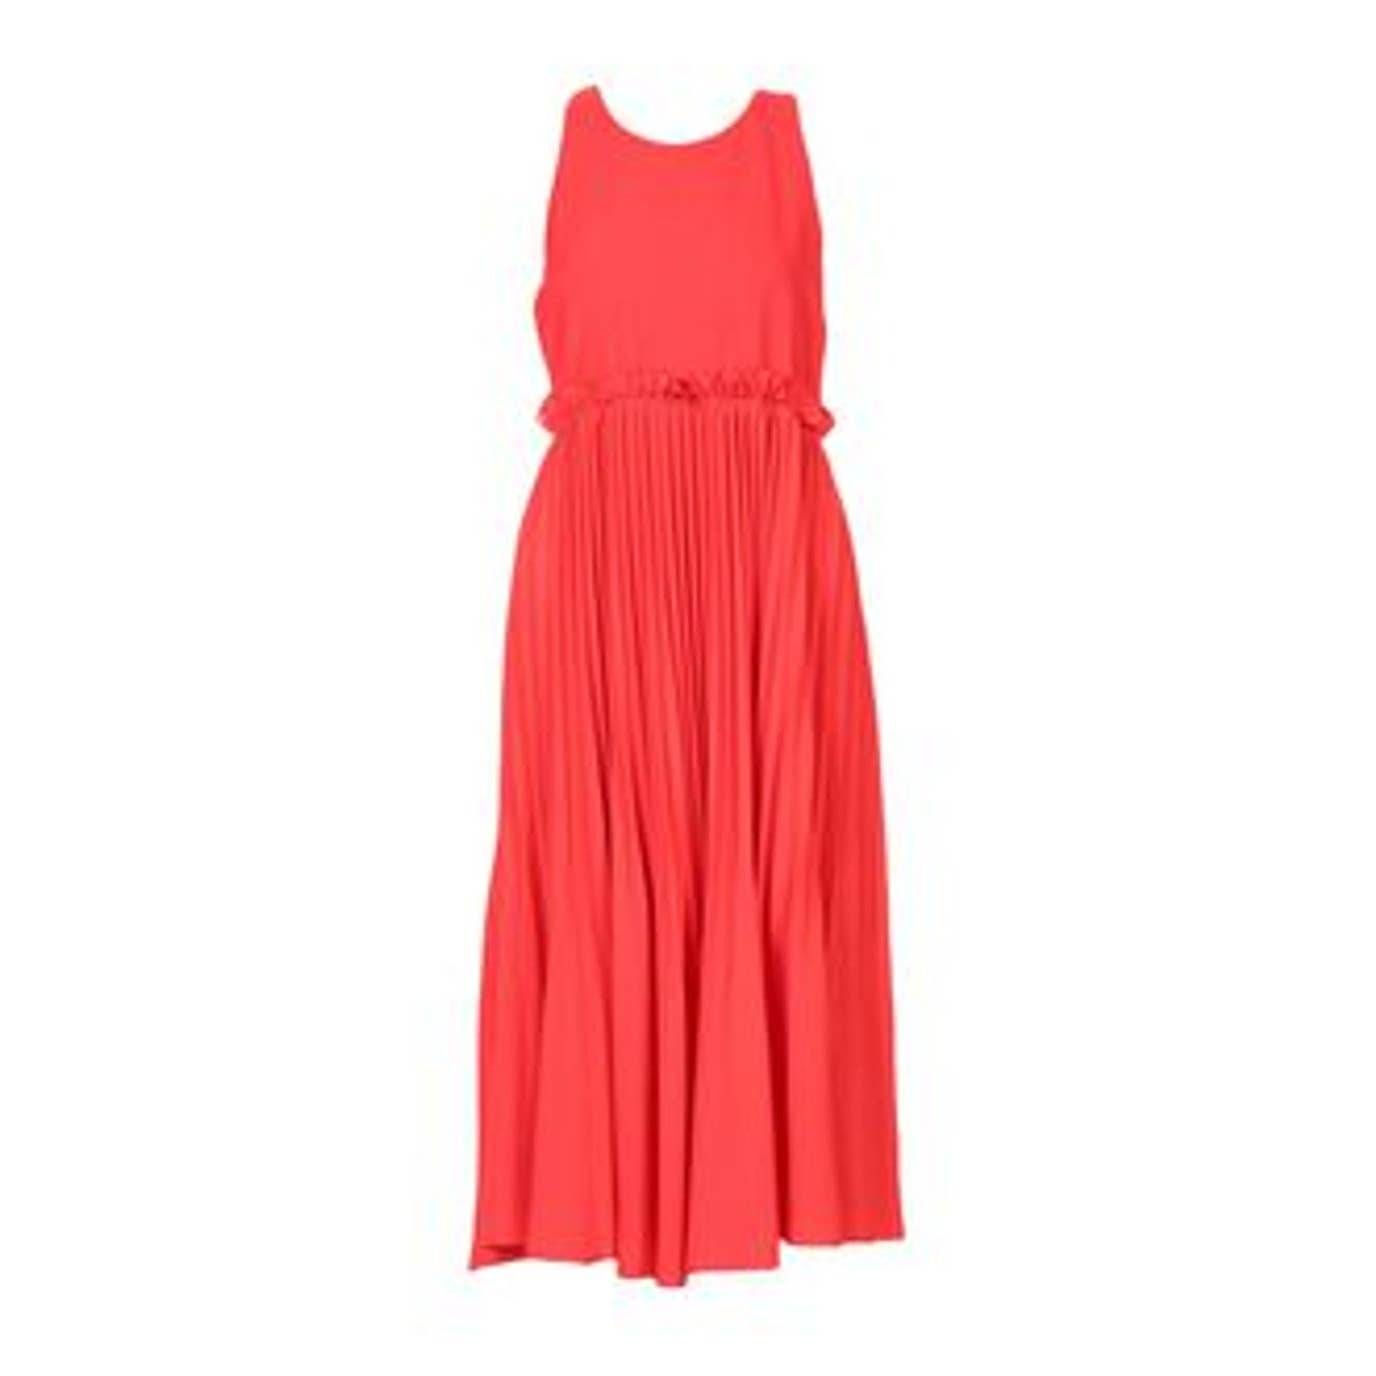 Pinko red midi sleeveless pleated dress